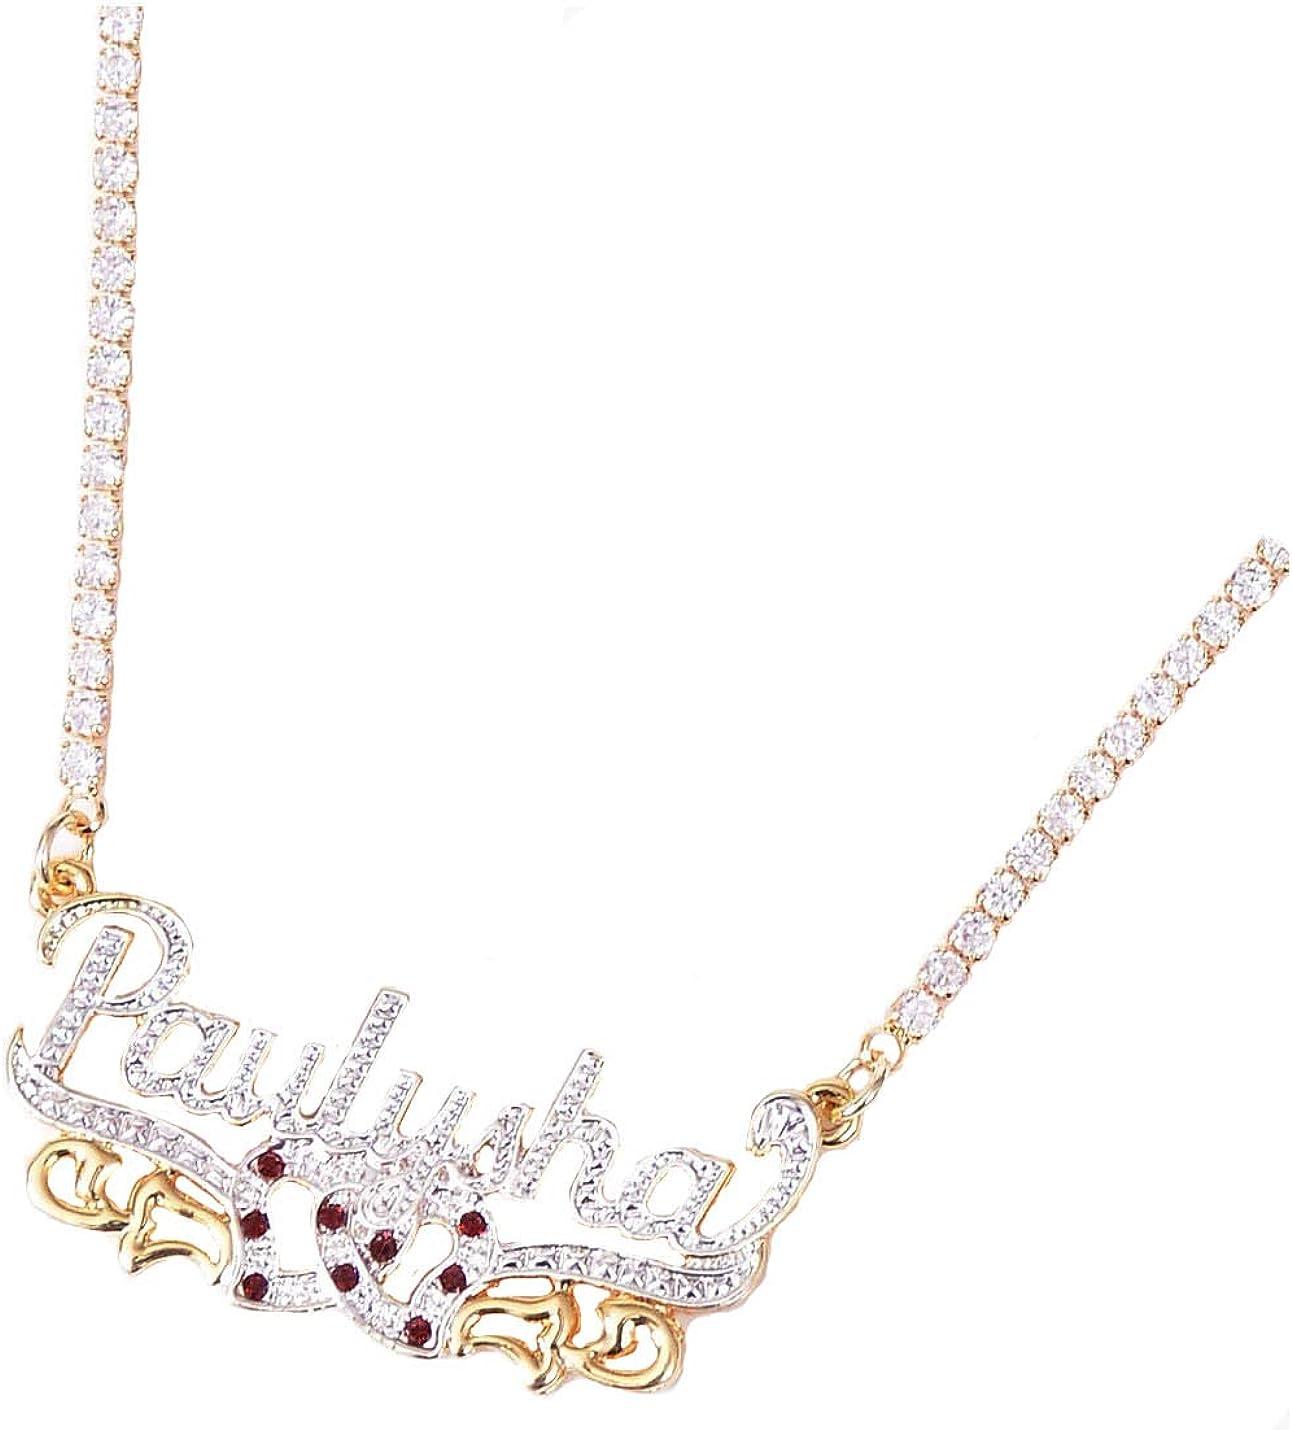 ywduoying Custom Name Jewelry for Women, Personalized Name Jewelry …